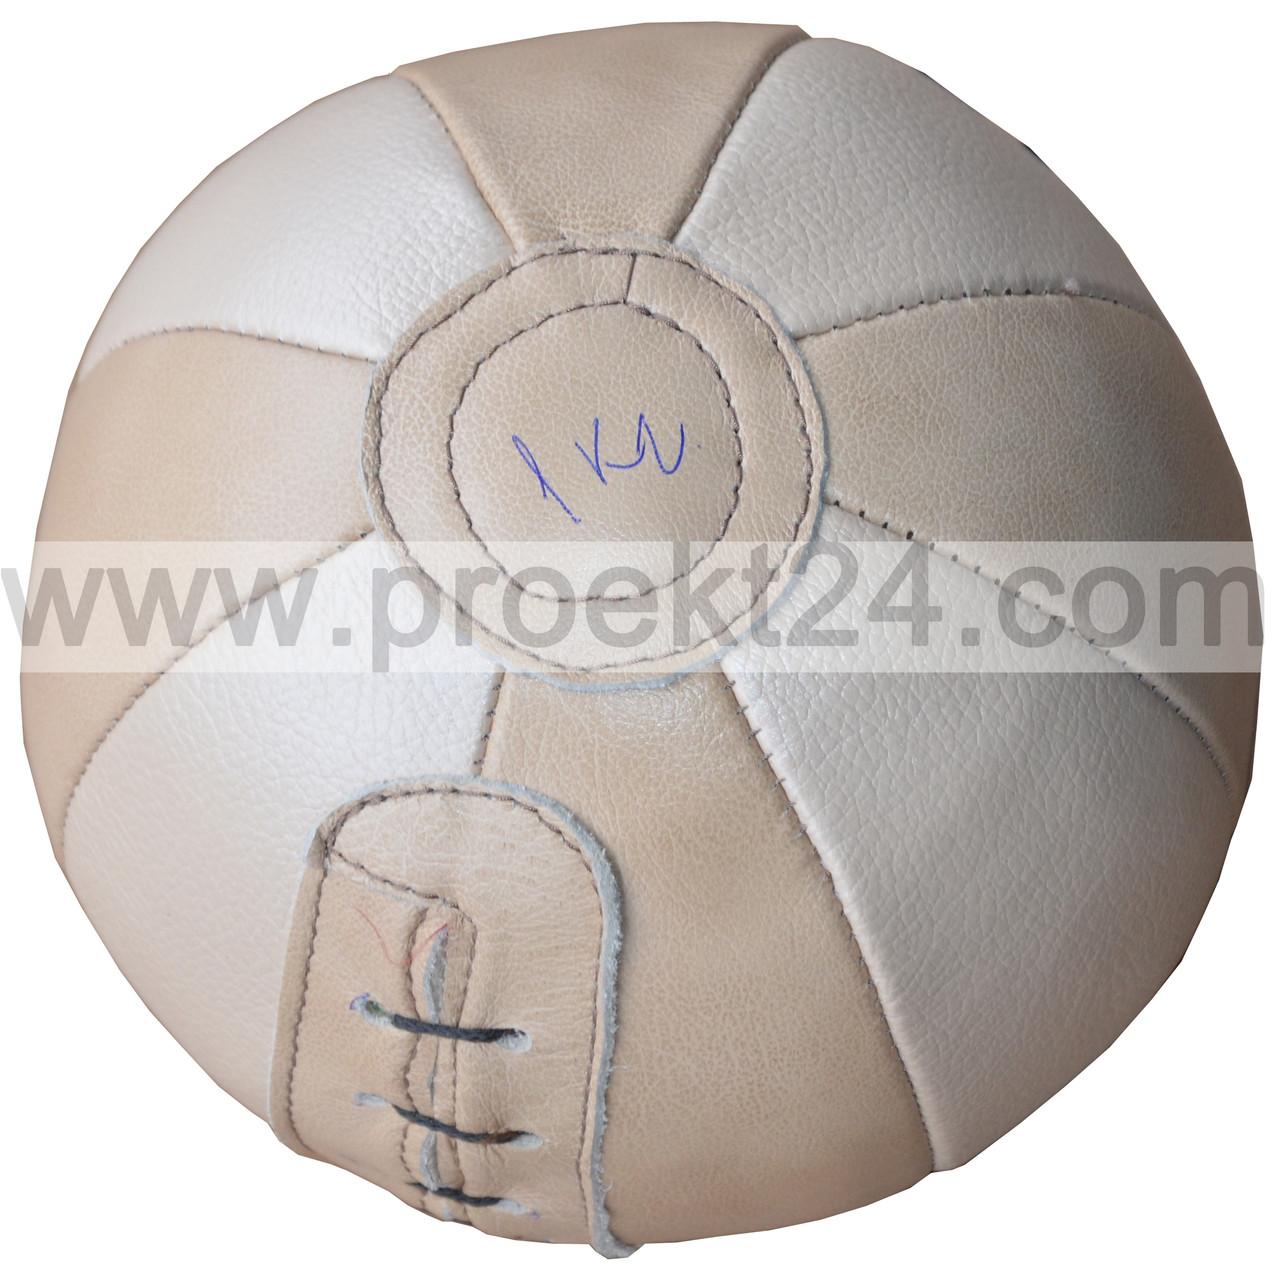 Медбол (медичний м'яч) 2кг